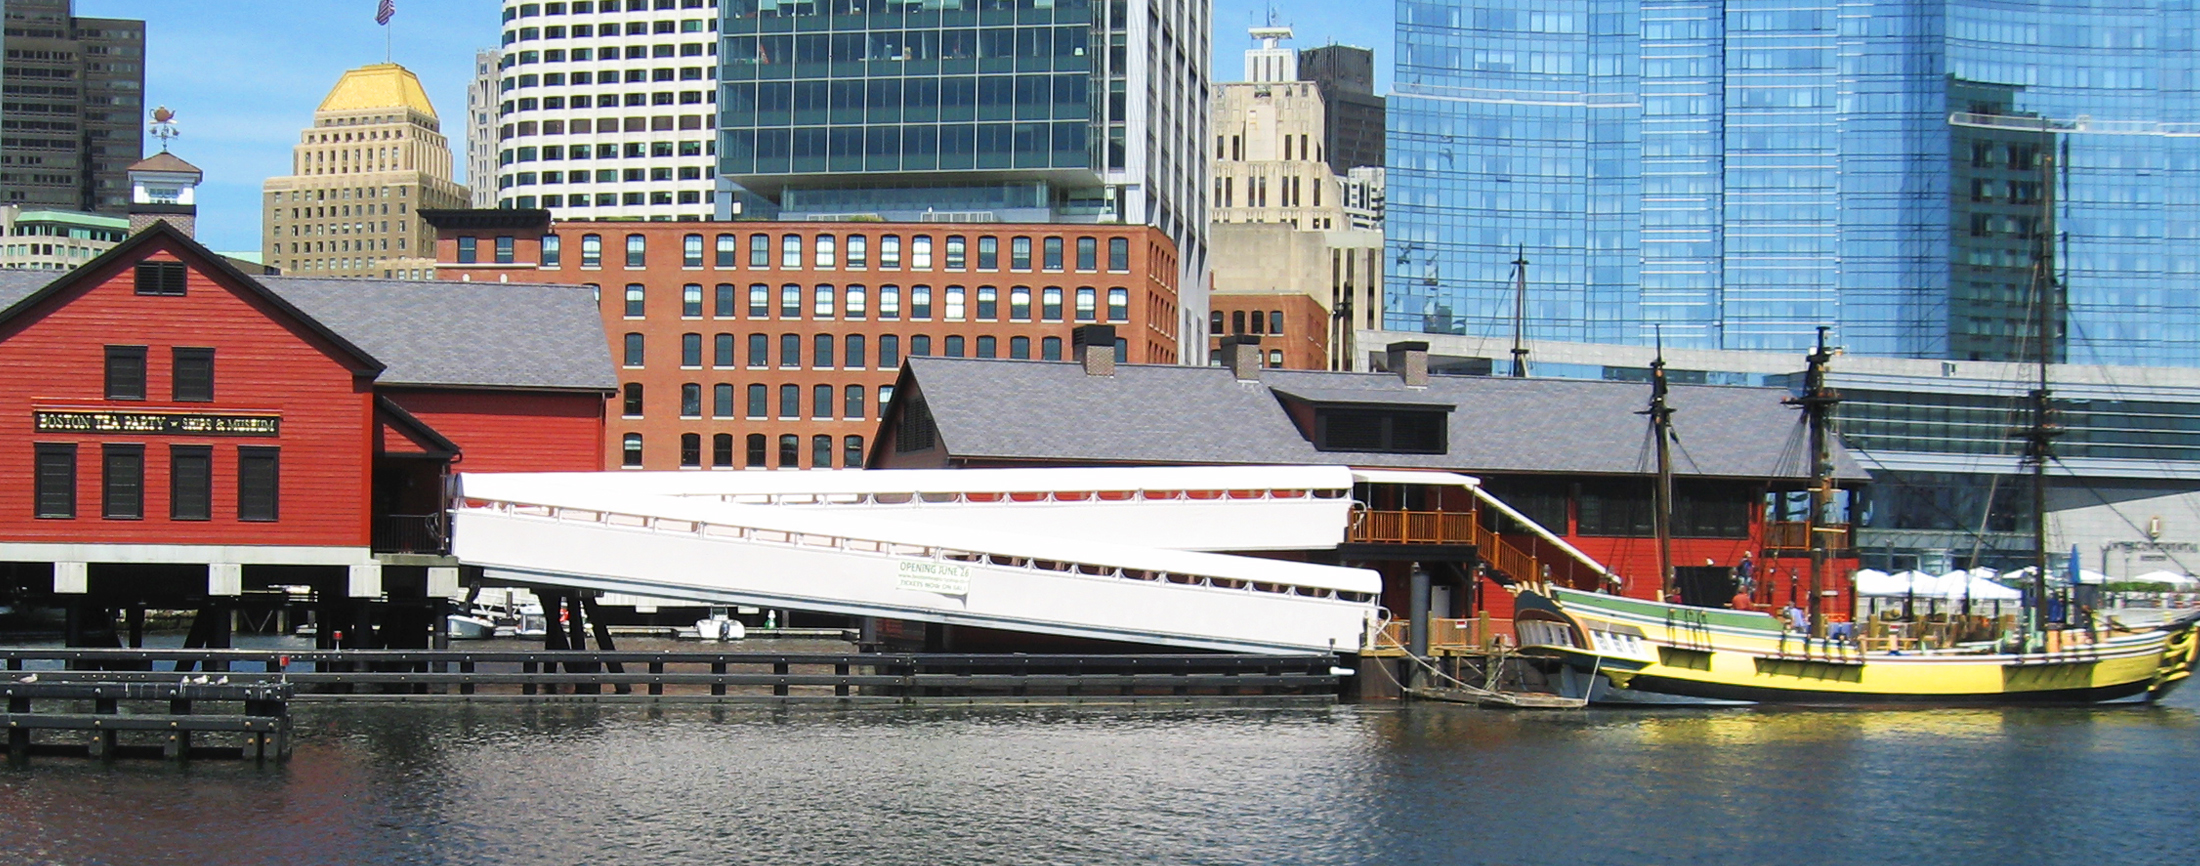 243rd Boston Tea Party Anniversary on December 16